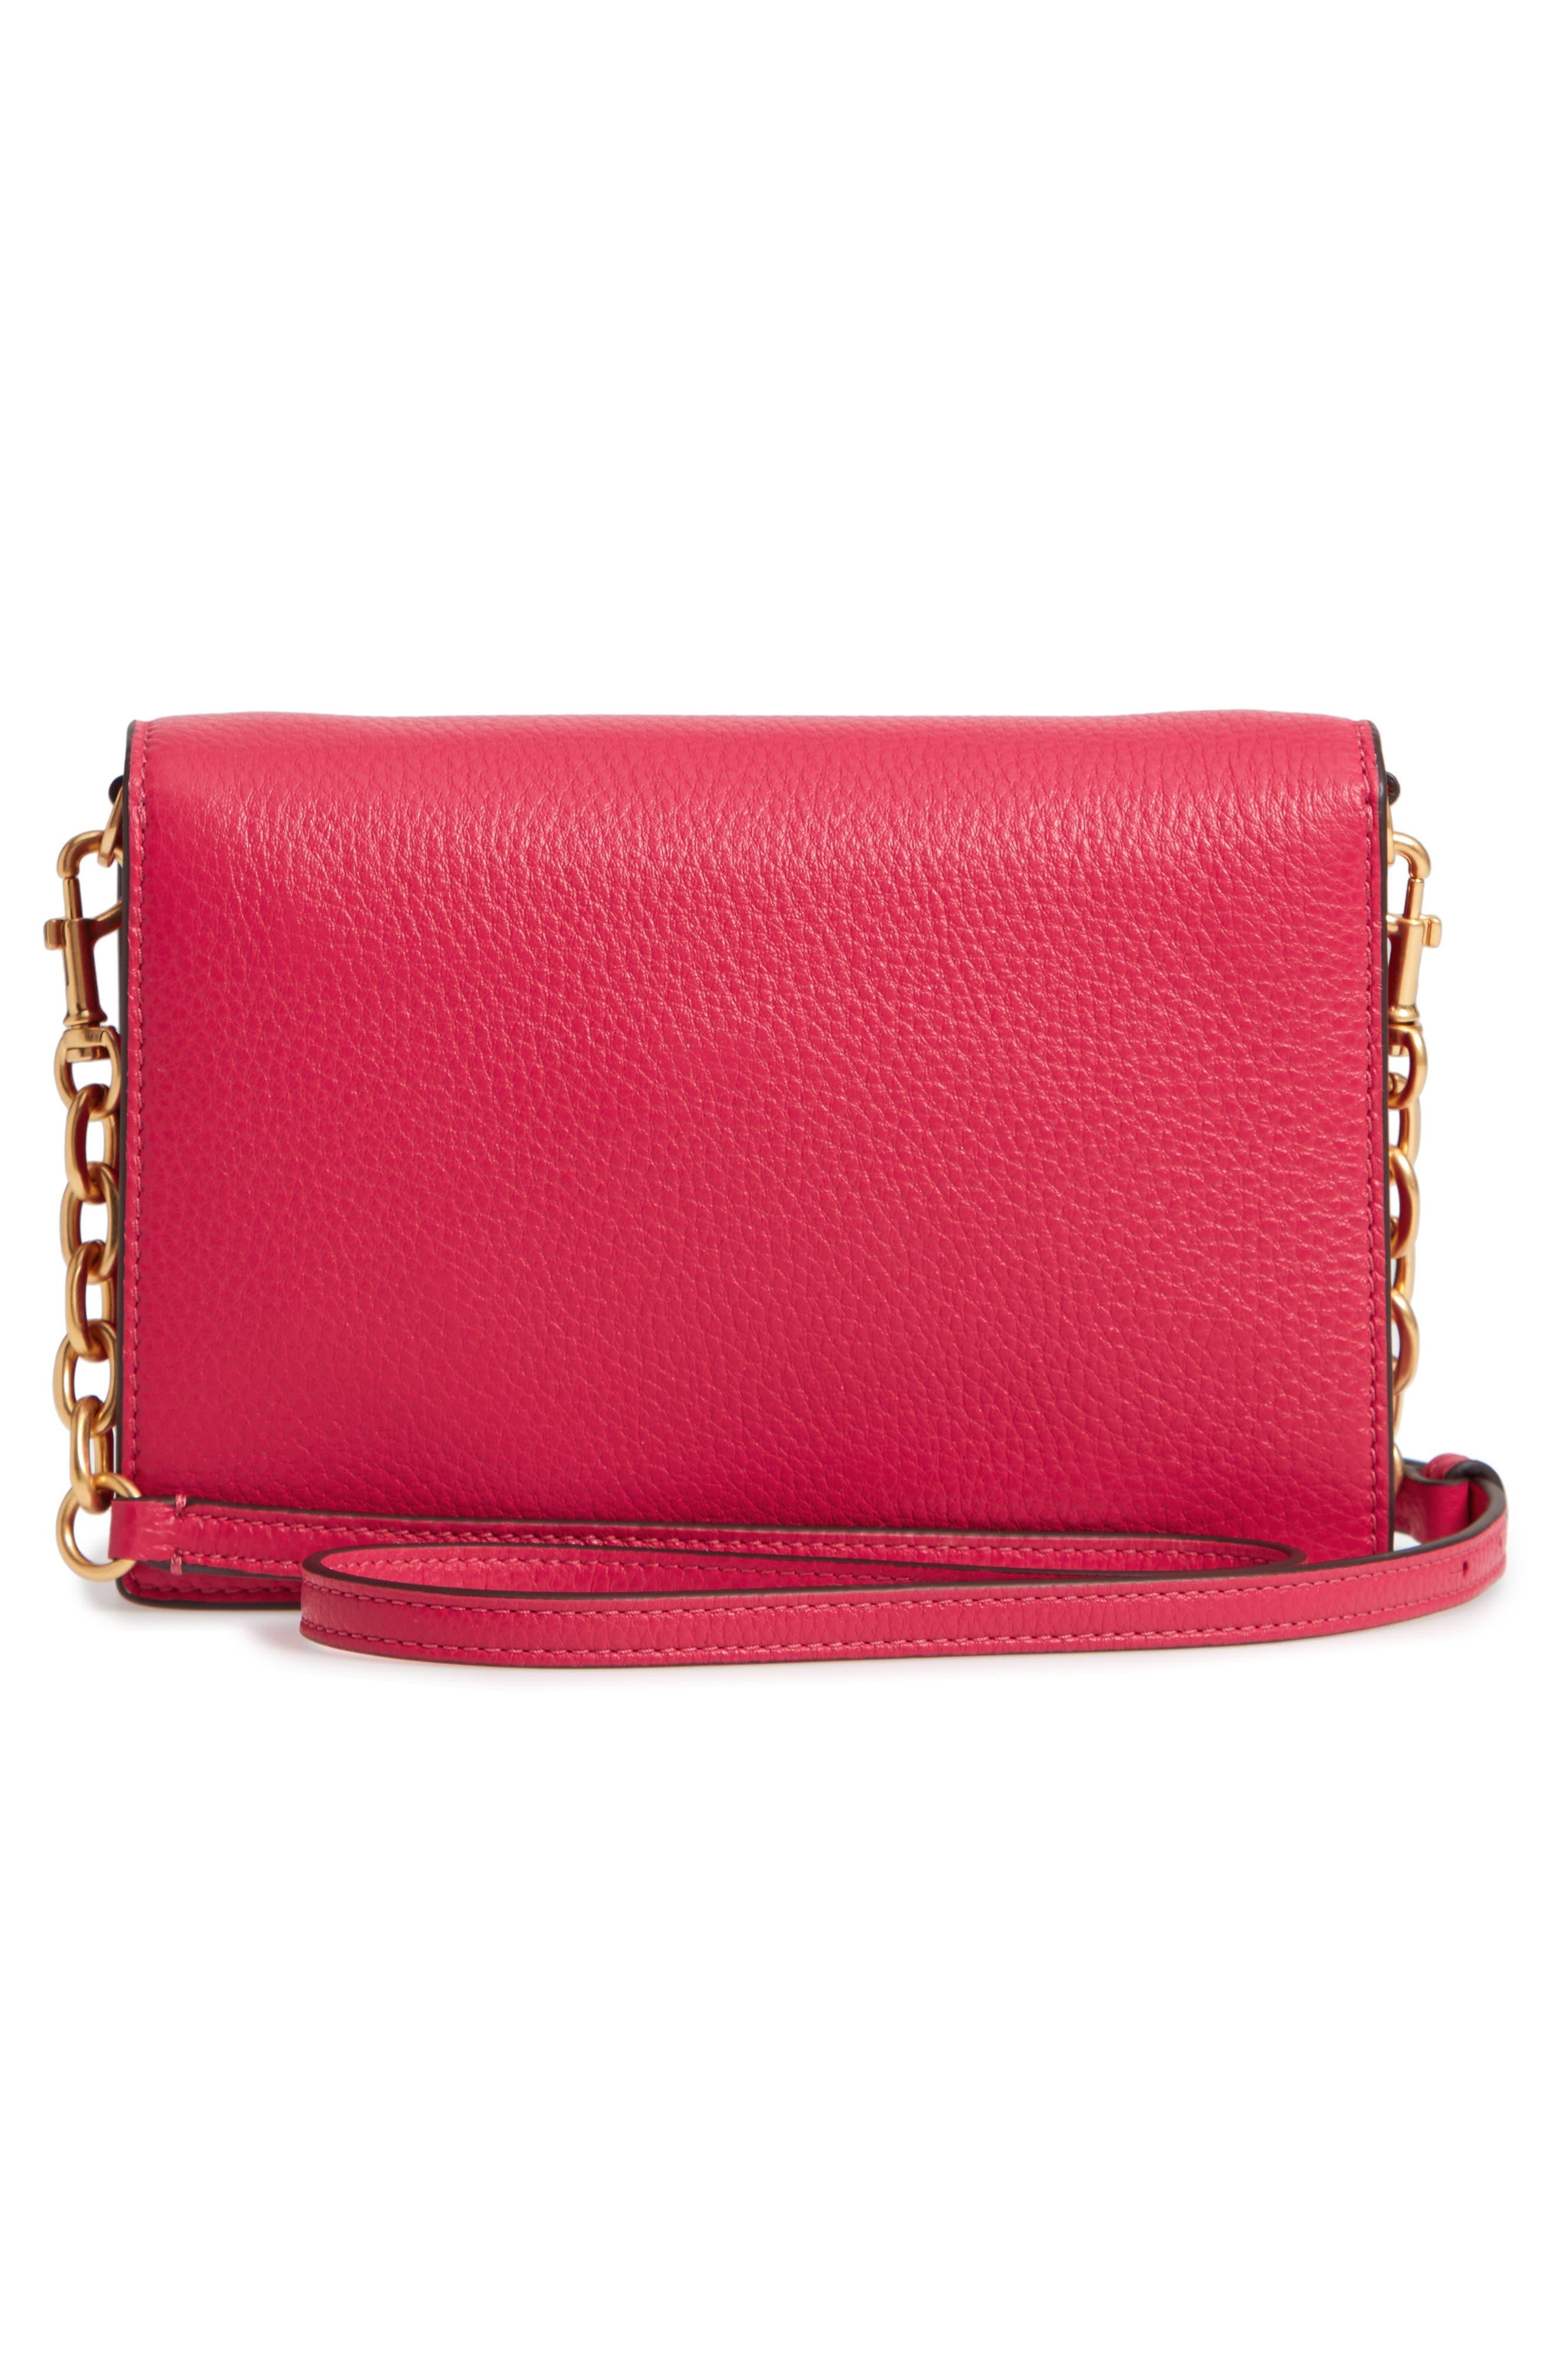 Georgia Pebble Leather Shoulder Bag,                             Alternate thumbnail 5, color,                             Bright Azalea